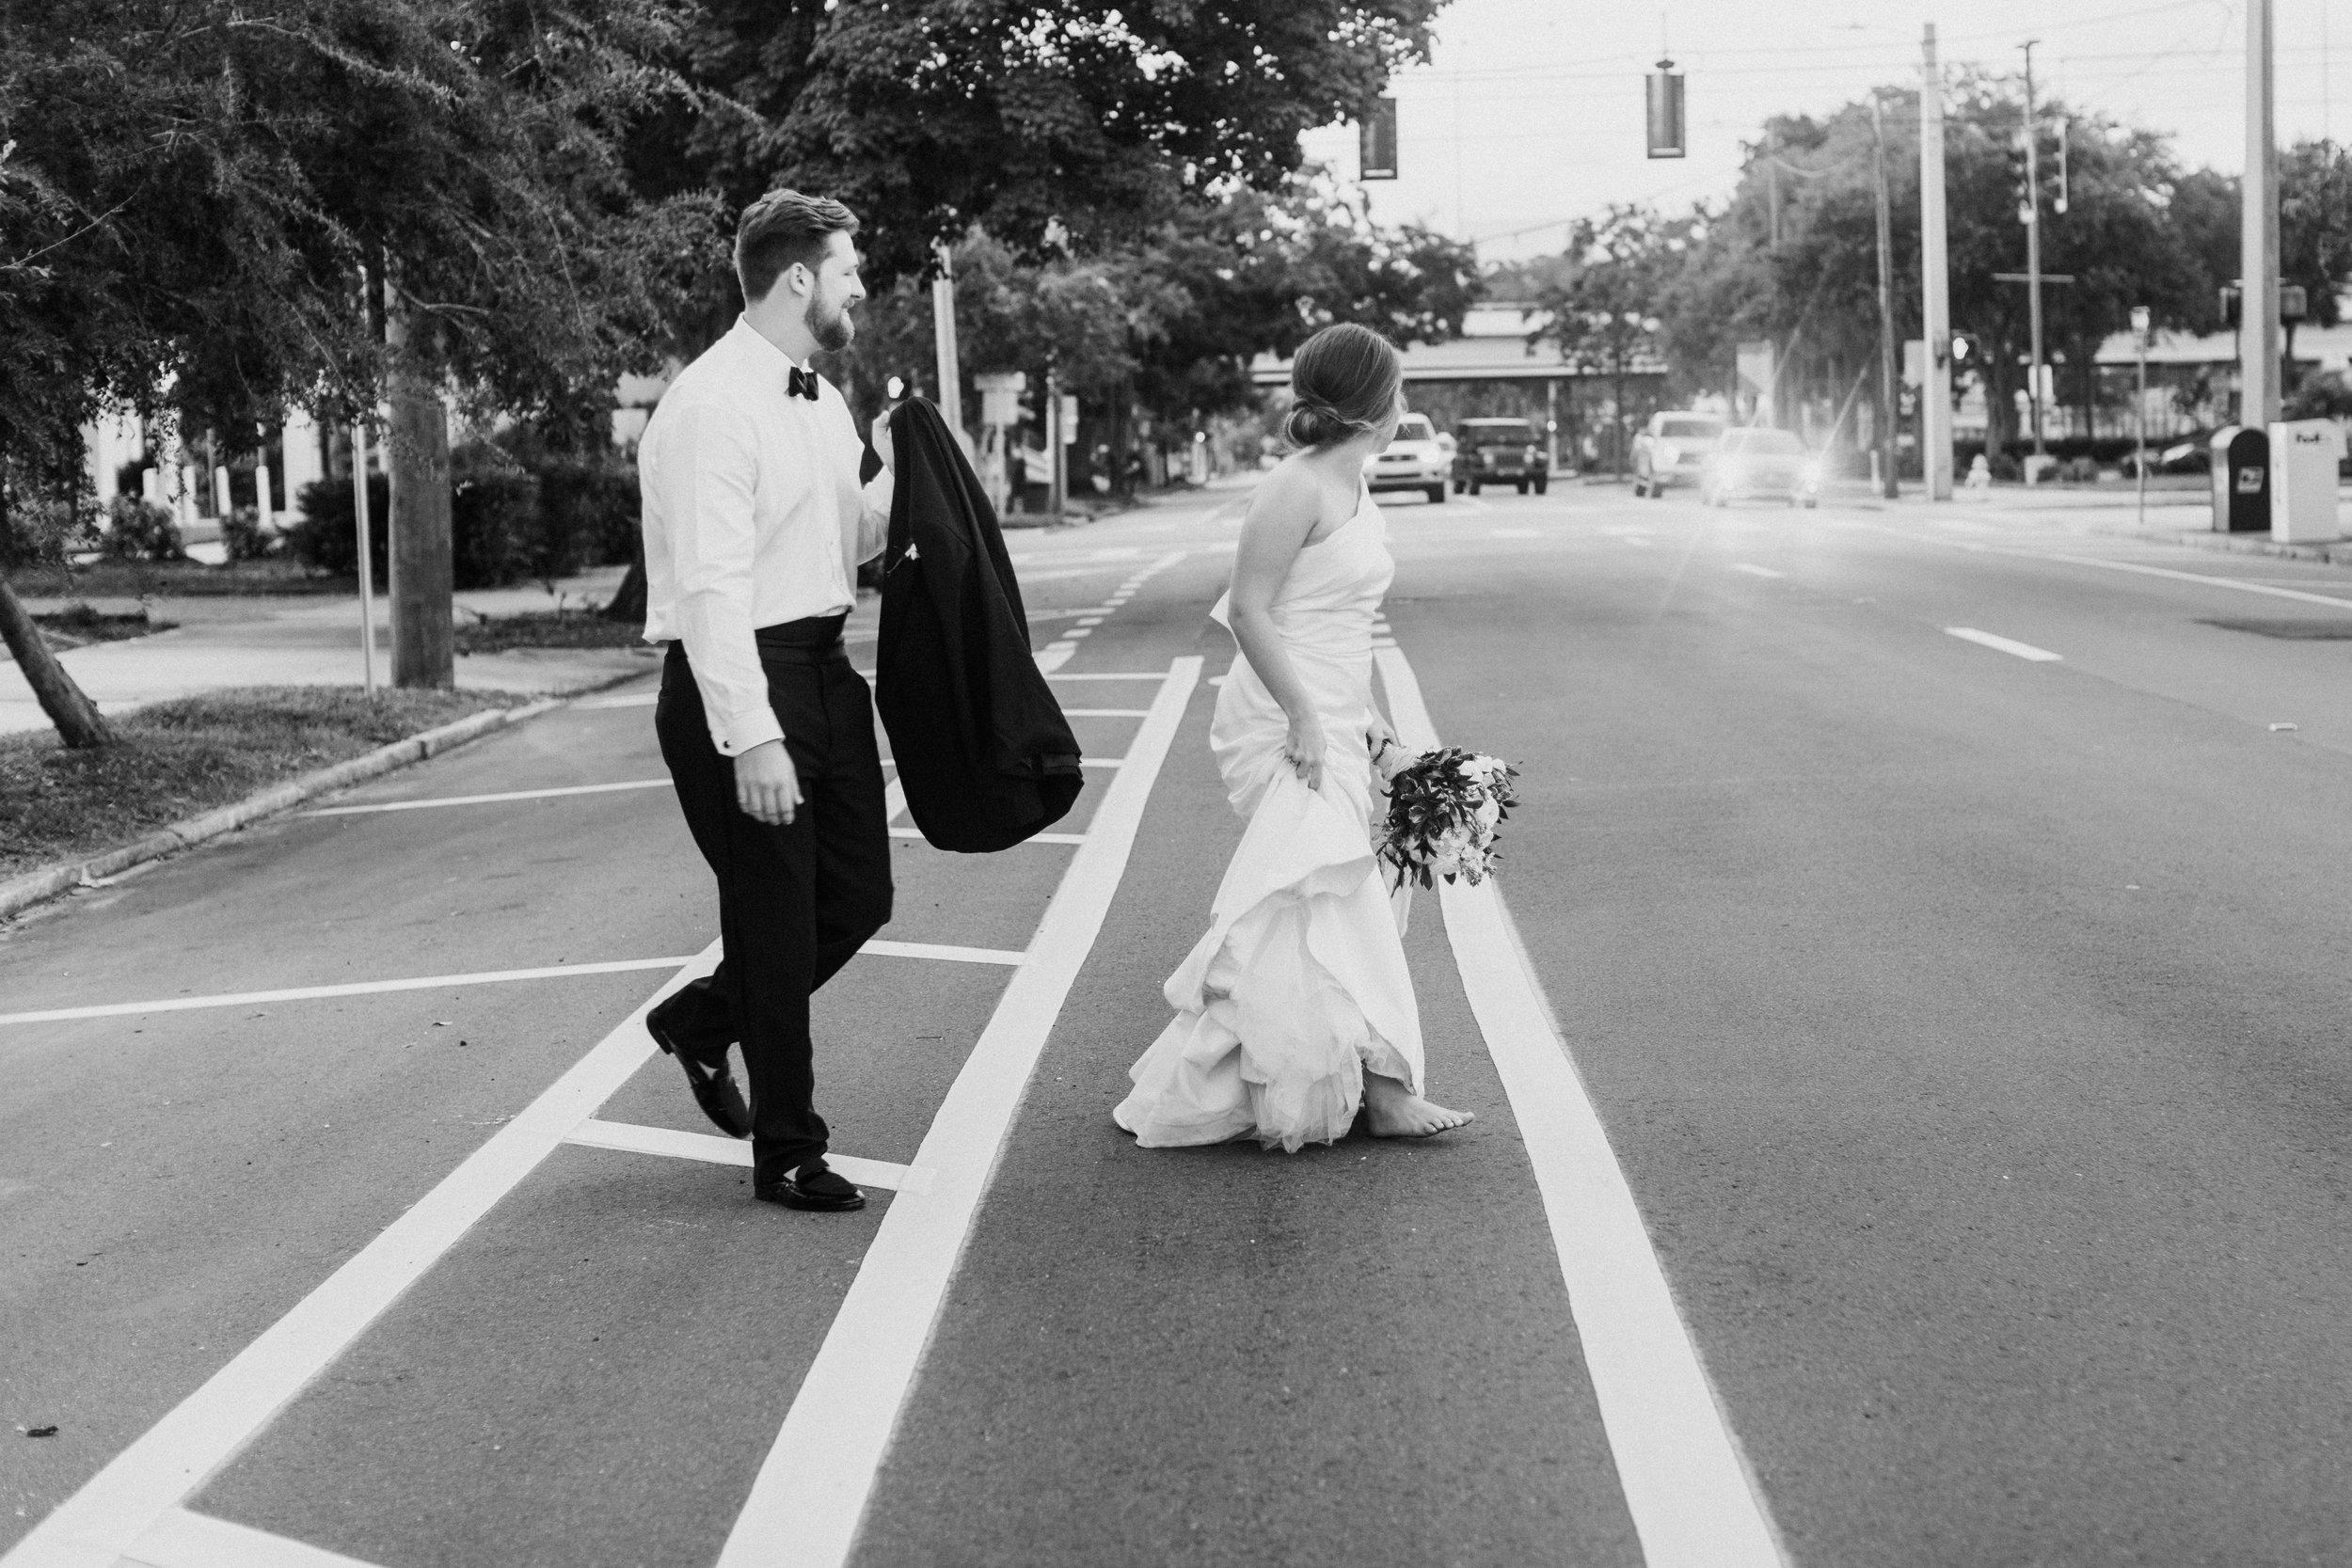 knoxville-wedding-photographer-256.JPG